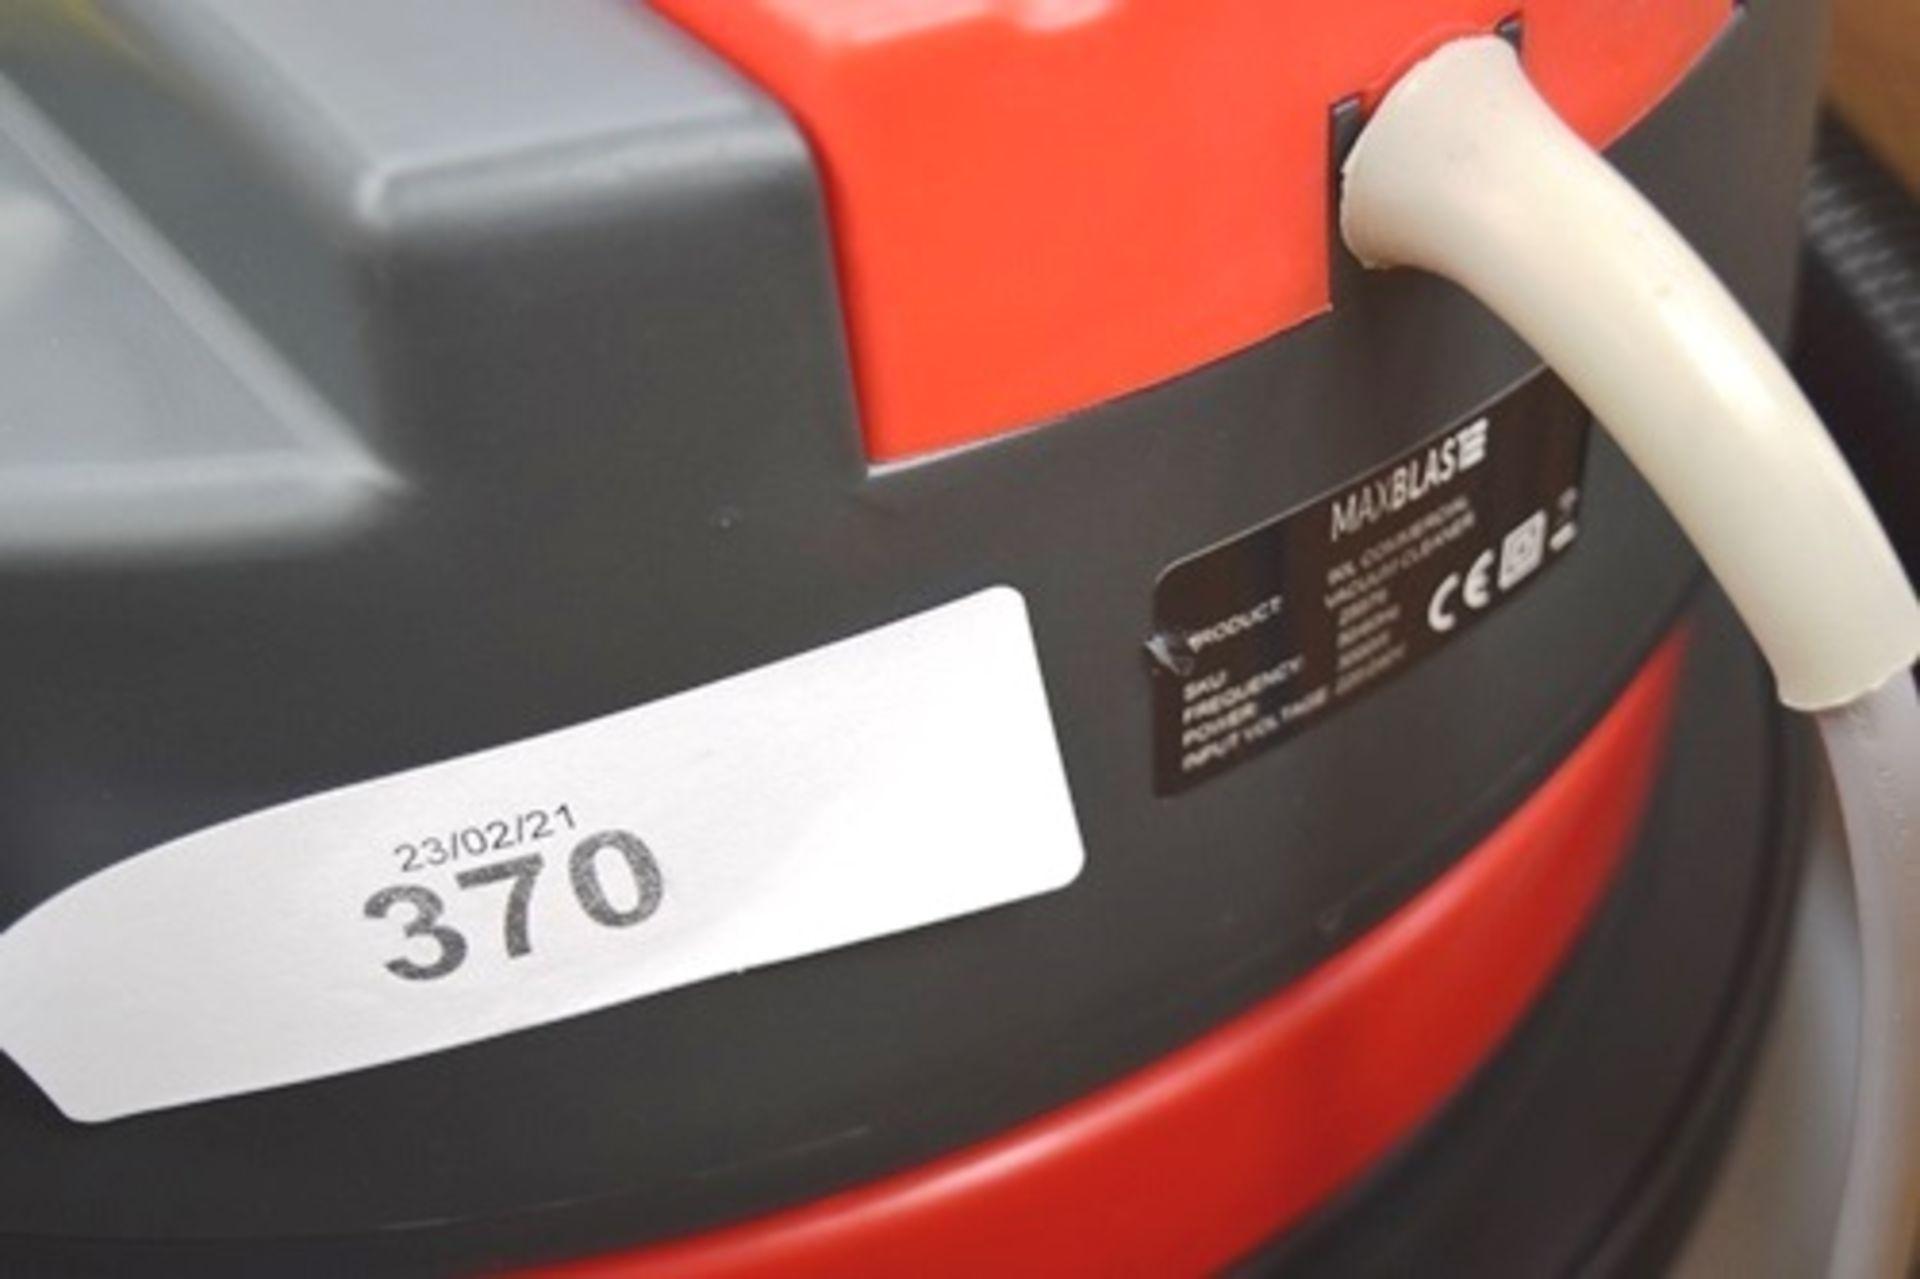 1 x Max Blast wet & dry 90ltr industrial vacuum, SKU: 25579 - New in box, box slightly tatty ( - Image 2 of 4